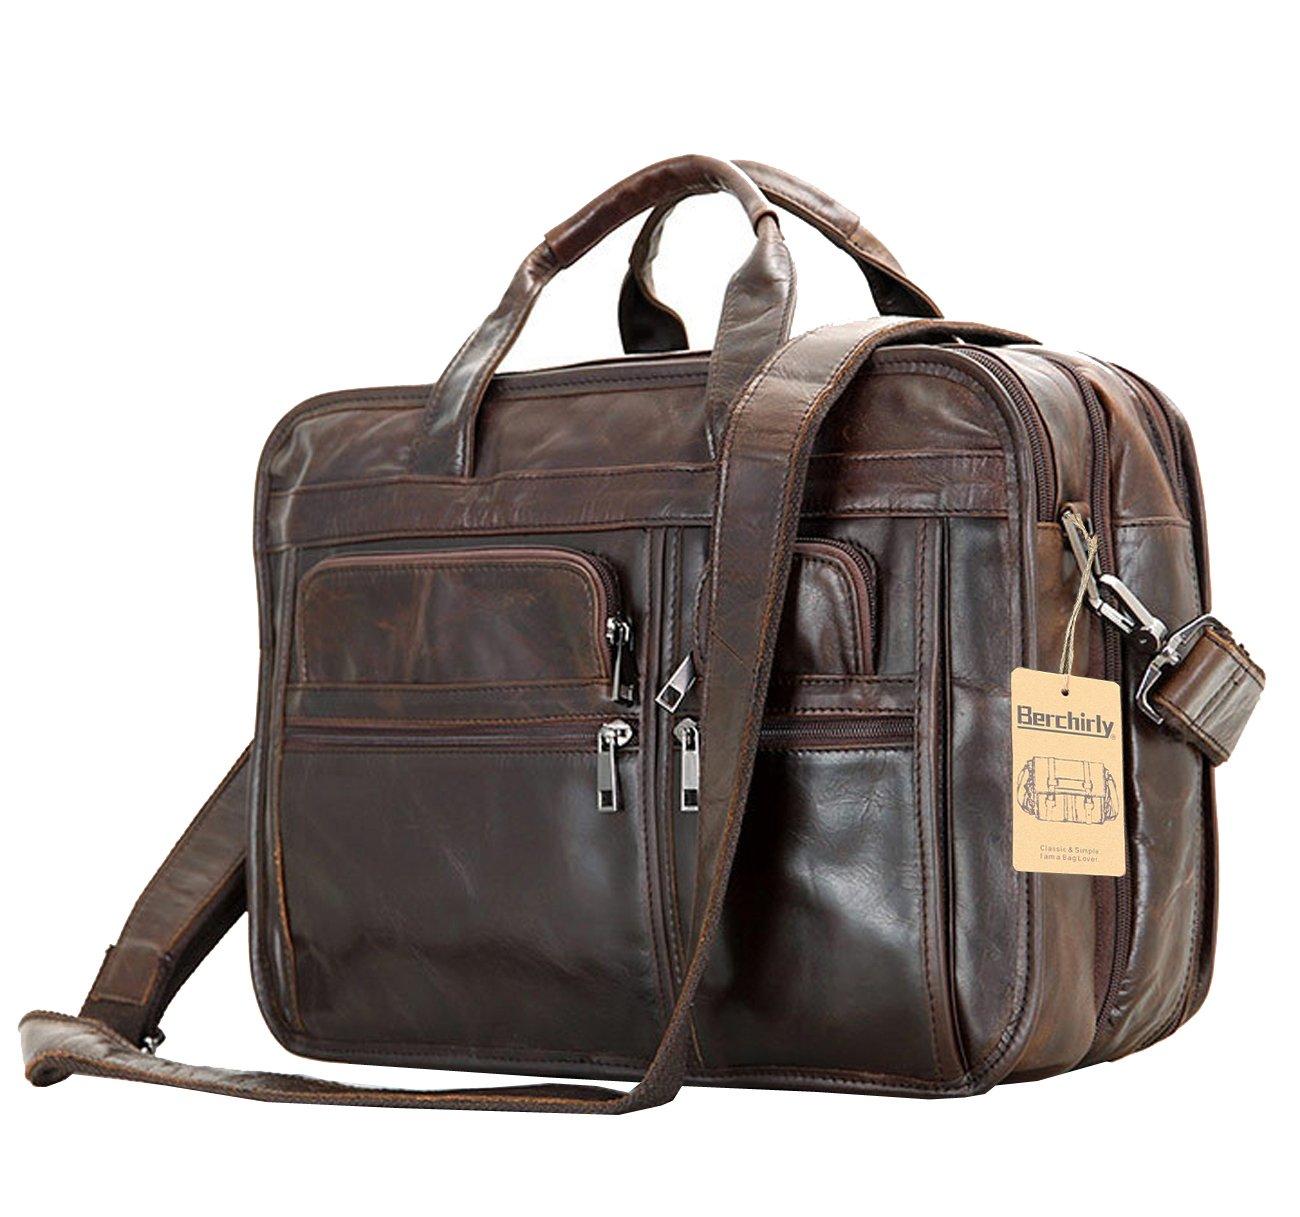 Leather Men Bag,Berchirly Genuine Leather 15.6inch Expandable Laptop Computer Business Briefcase Bags Cowhide Handbag Case